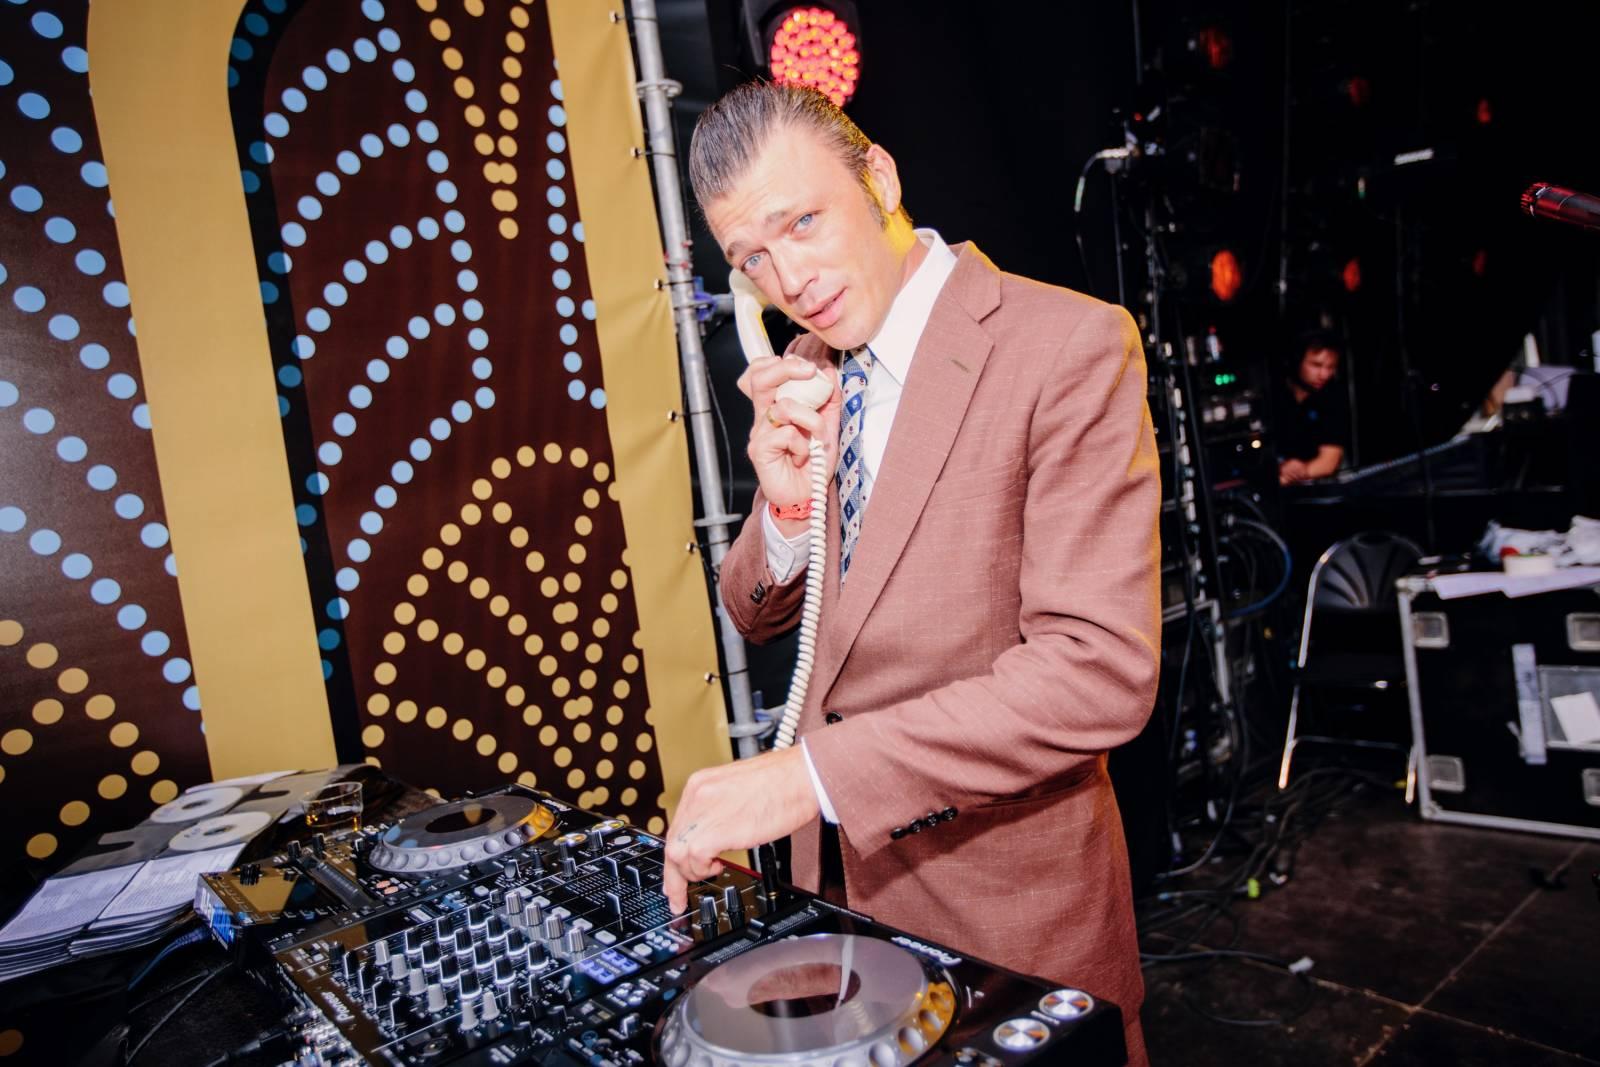 Wedding DJ Benny Blue - DJ - Live Muziek - House of Weddings - 12